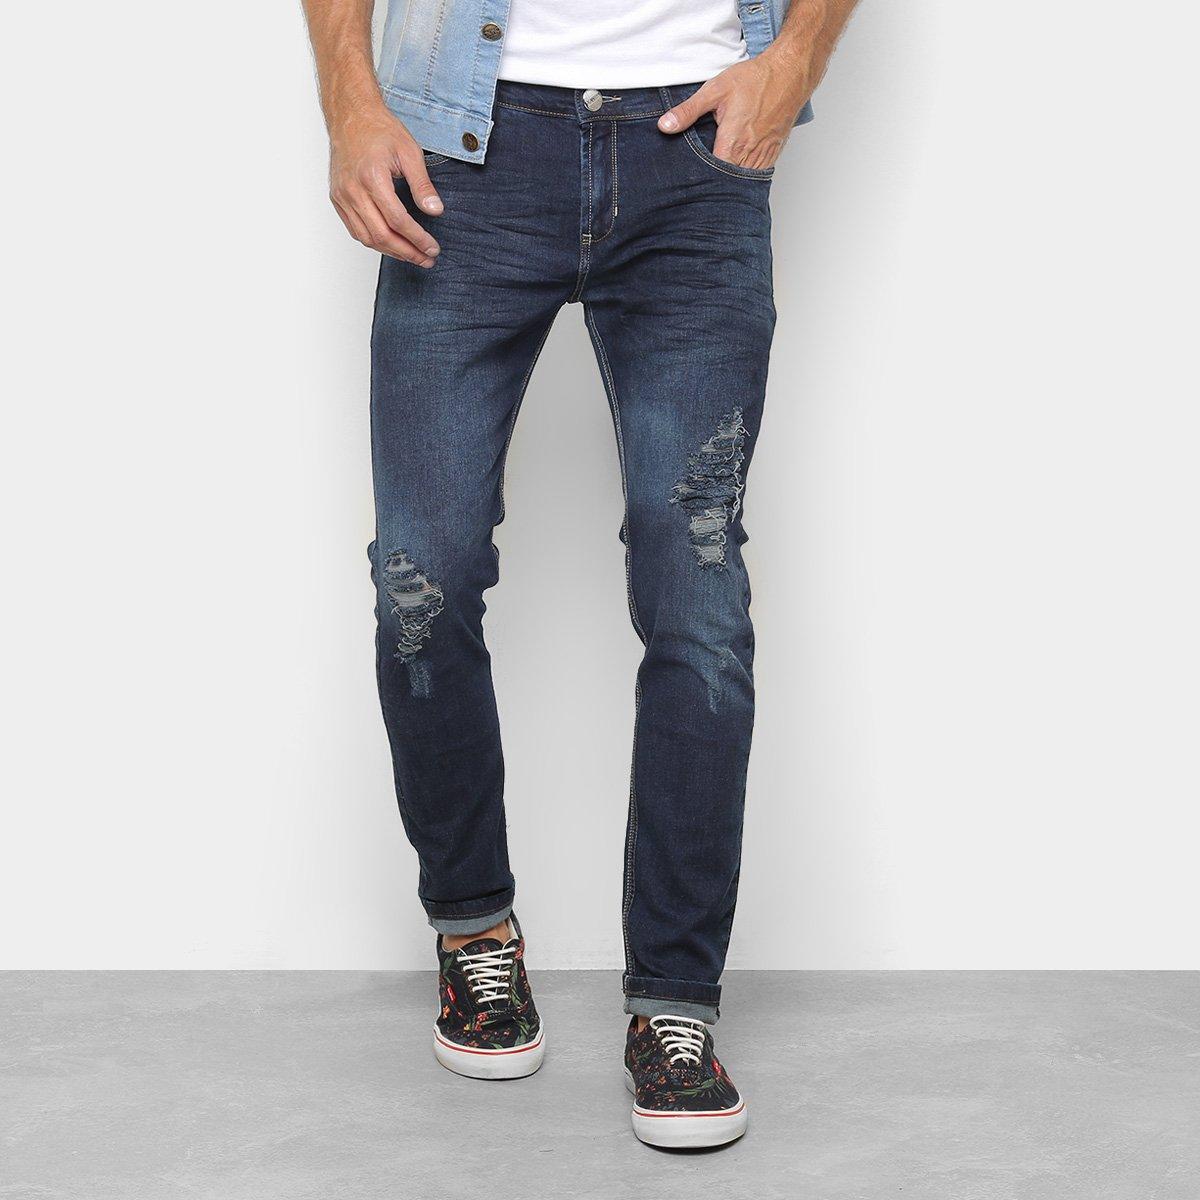 7357be086 Calça Jeans Skinny Preston Estonada Puídos Cintura Baixa Masculina